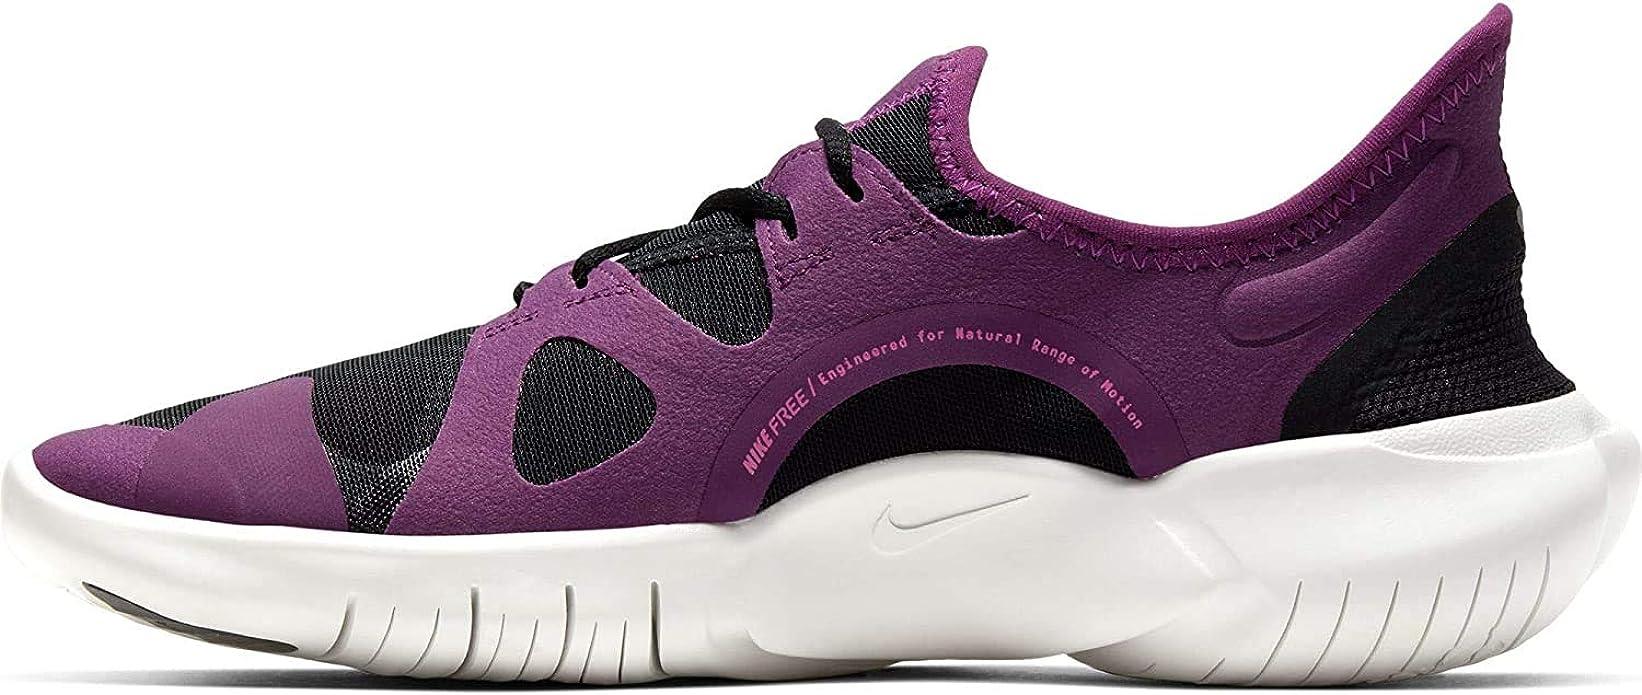 Botánica Sin cabeza Permanentemente  Amazon.com   Nike Women's Free Rn 5.0 Running Shoes, 5.5 us   Road Running